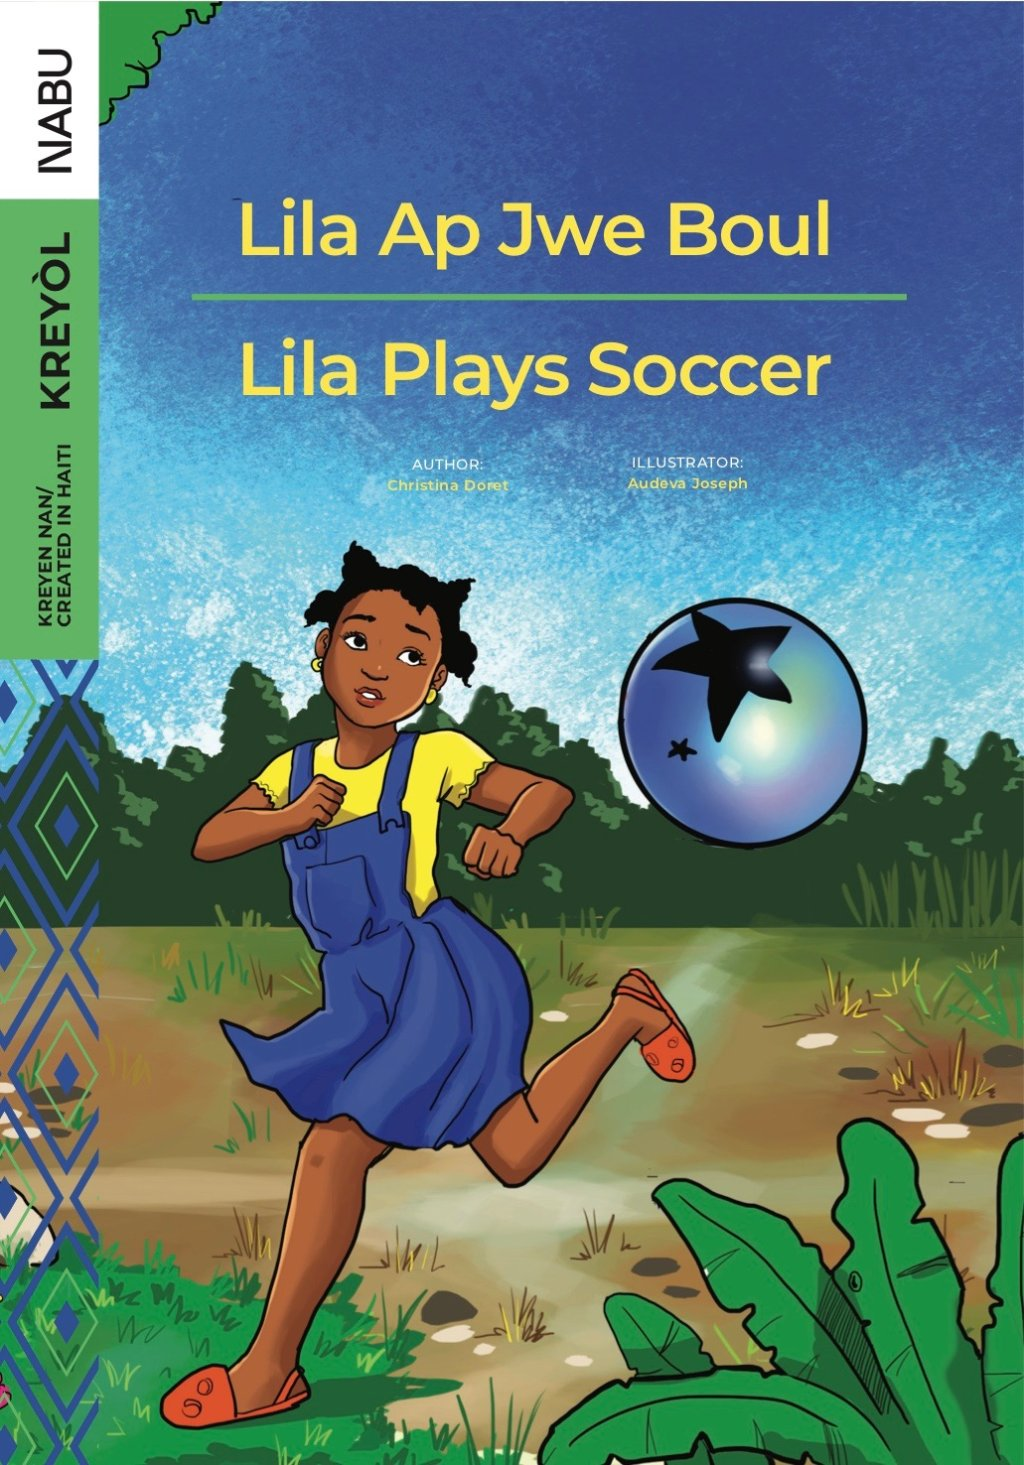 Lila Plays Soccer